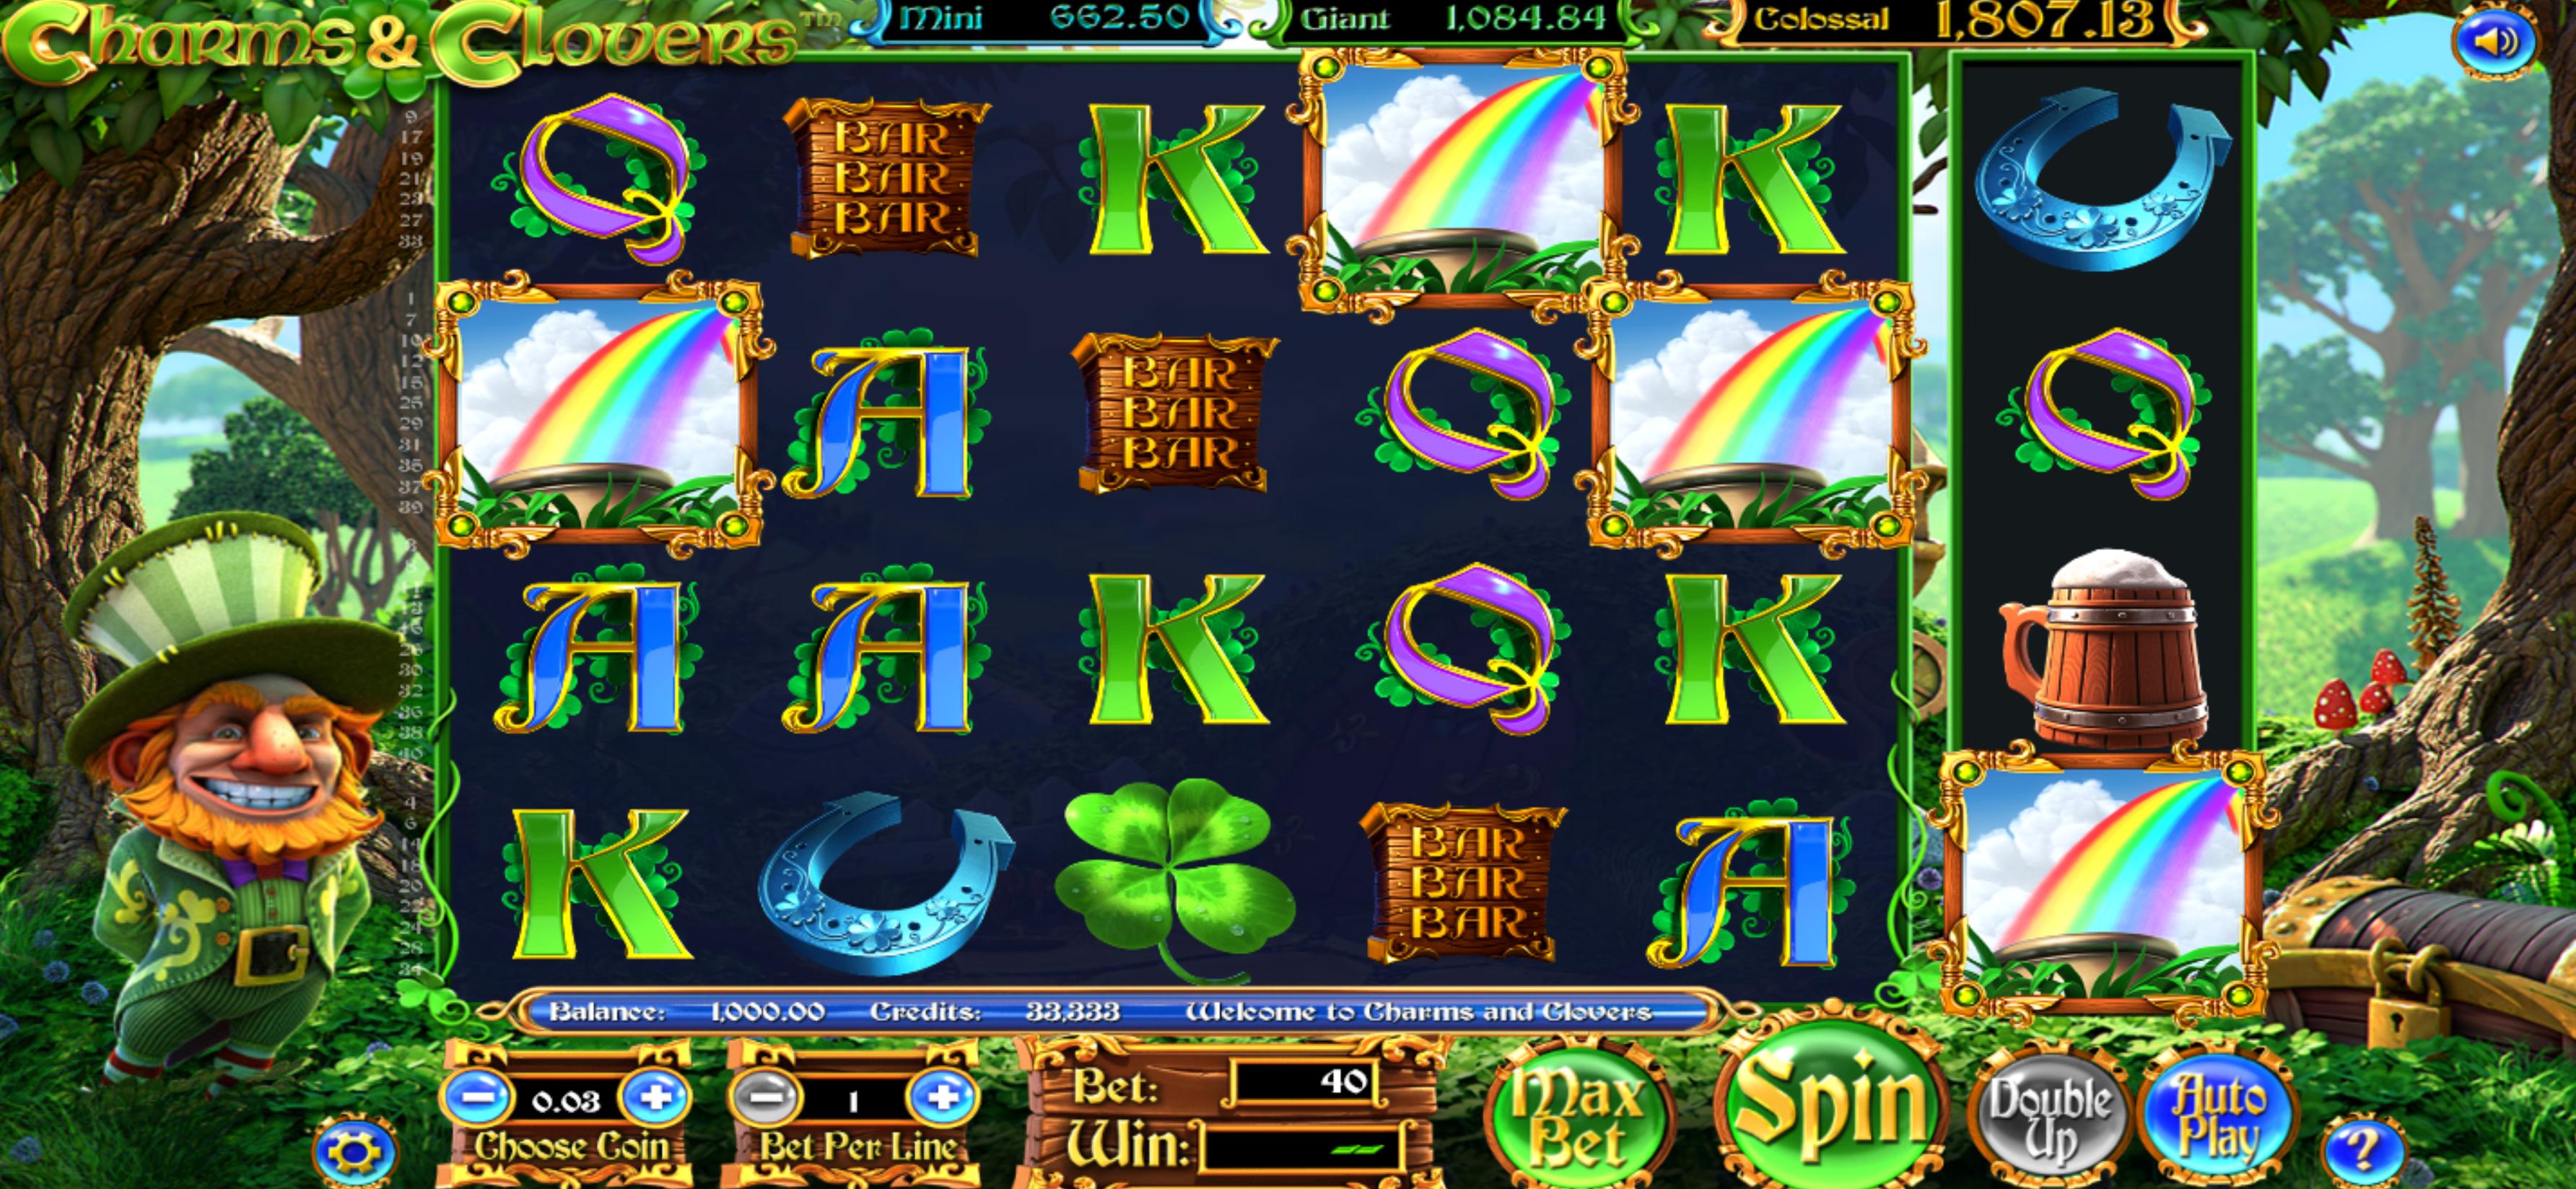 1 Deposit Casino Nz Play For Epic Wins Casinowatch